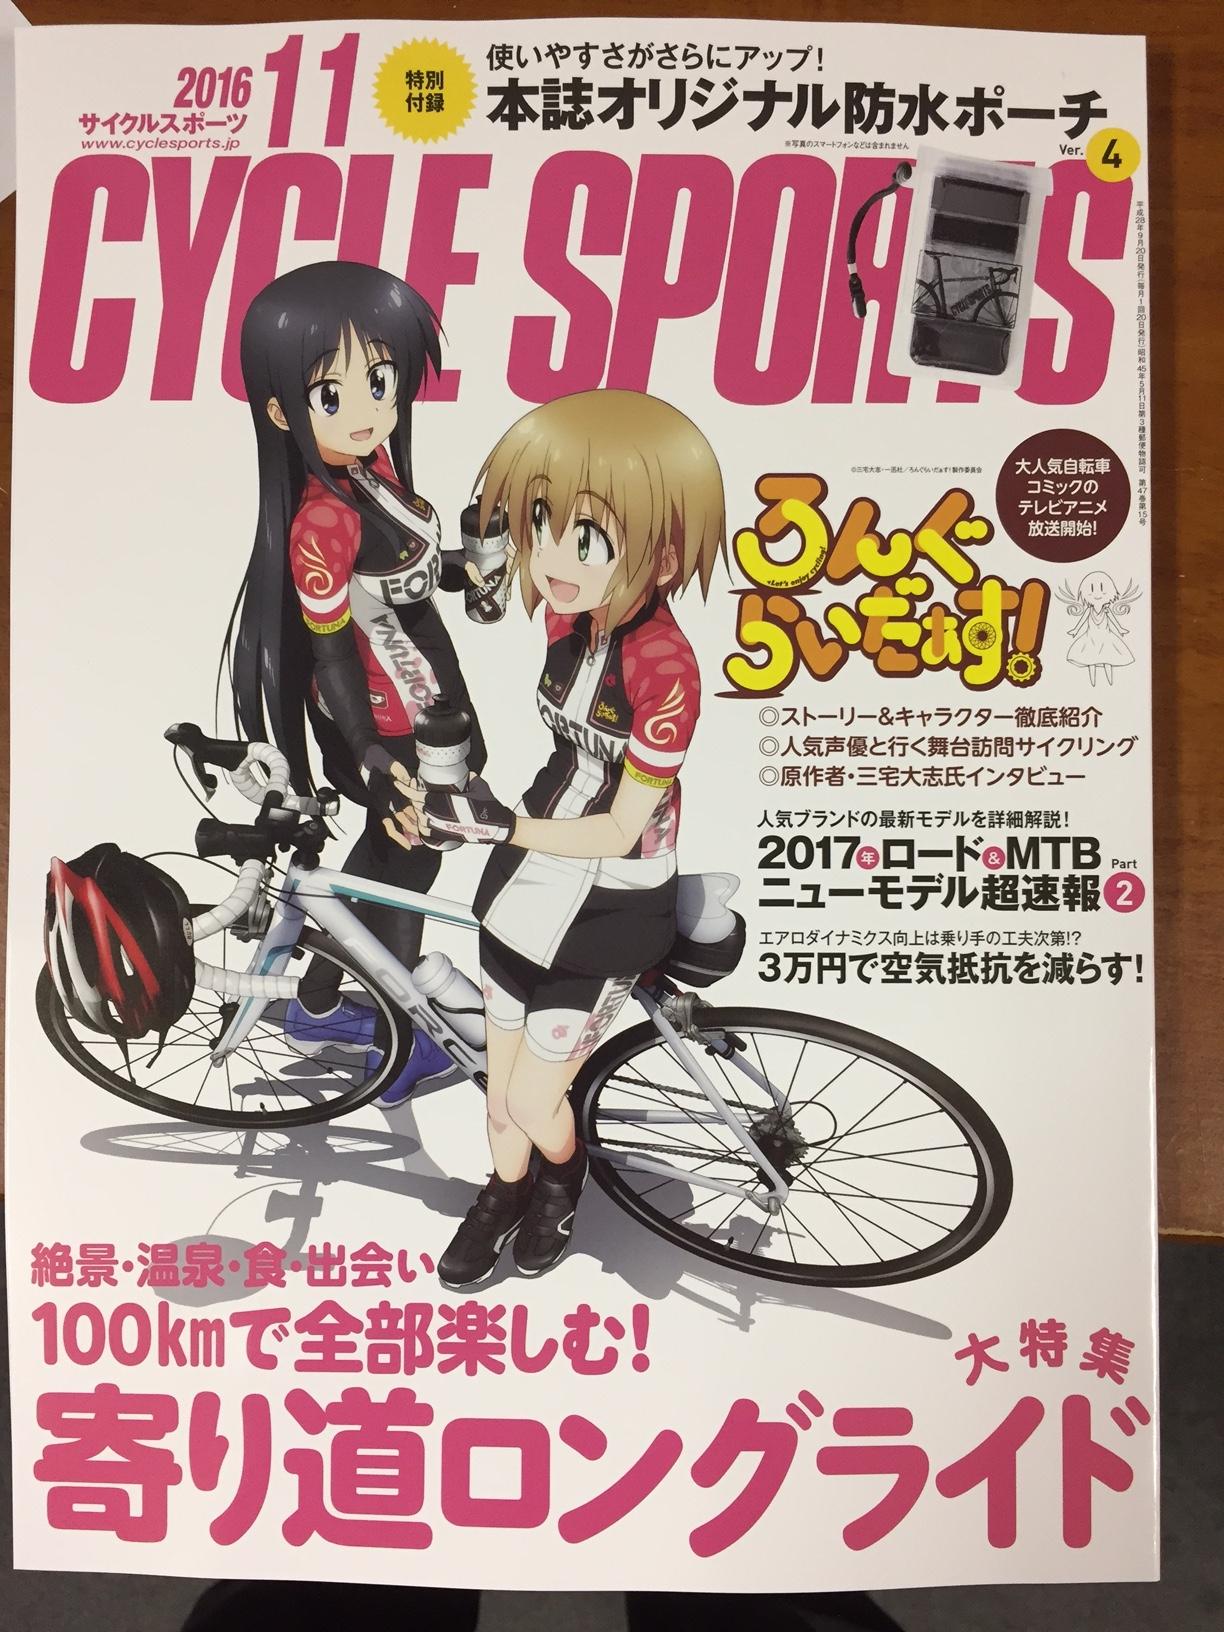 Cycle-Sports-11-1.jpg